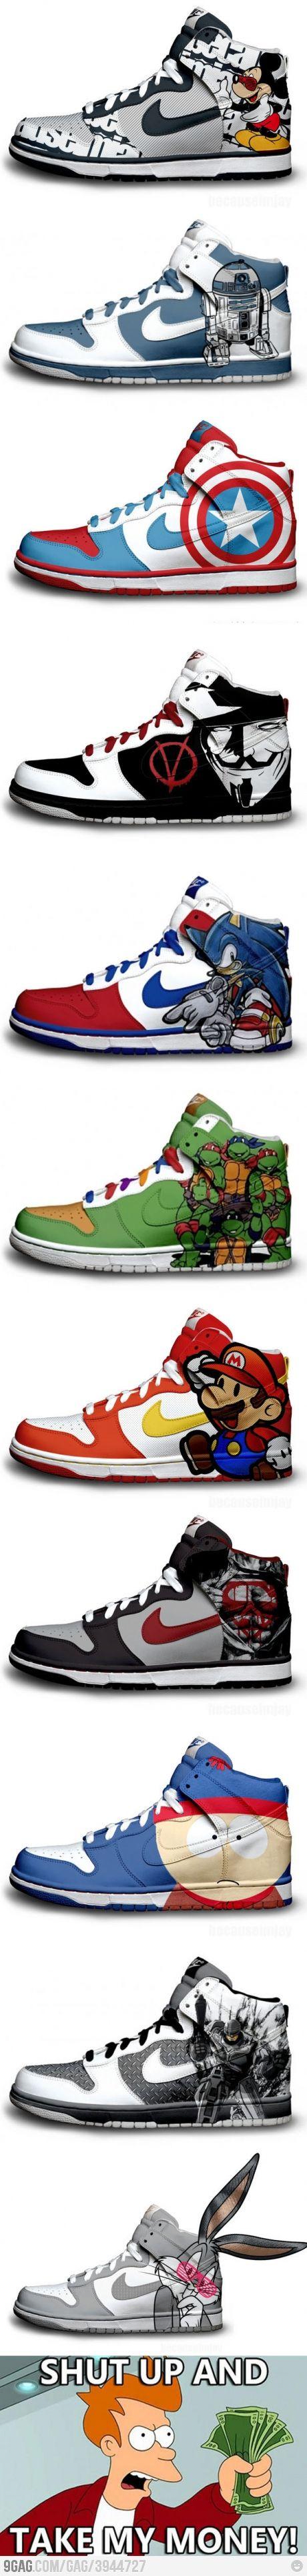 Very coolMickey Mouse, Ninjas Turtles, Birthday Gift, Captain America, Bugs Bunnies, Nike Shoes, Nike Sneakers, Ninja Turtles, Bugs Bunny